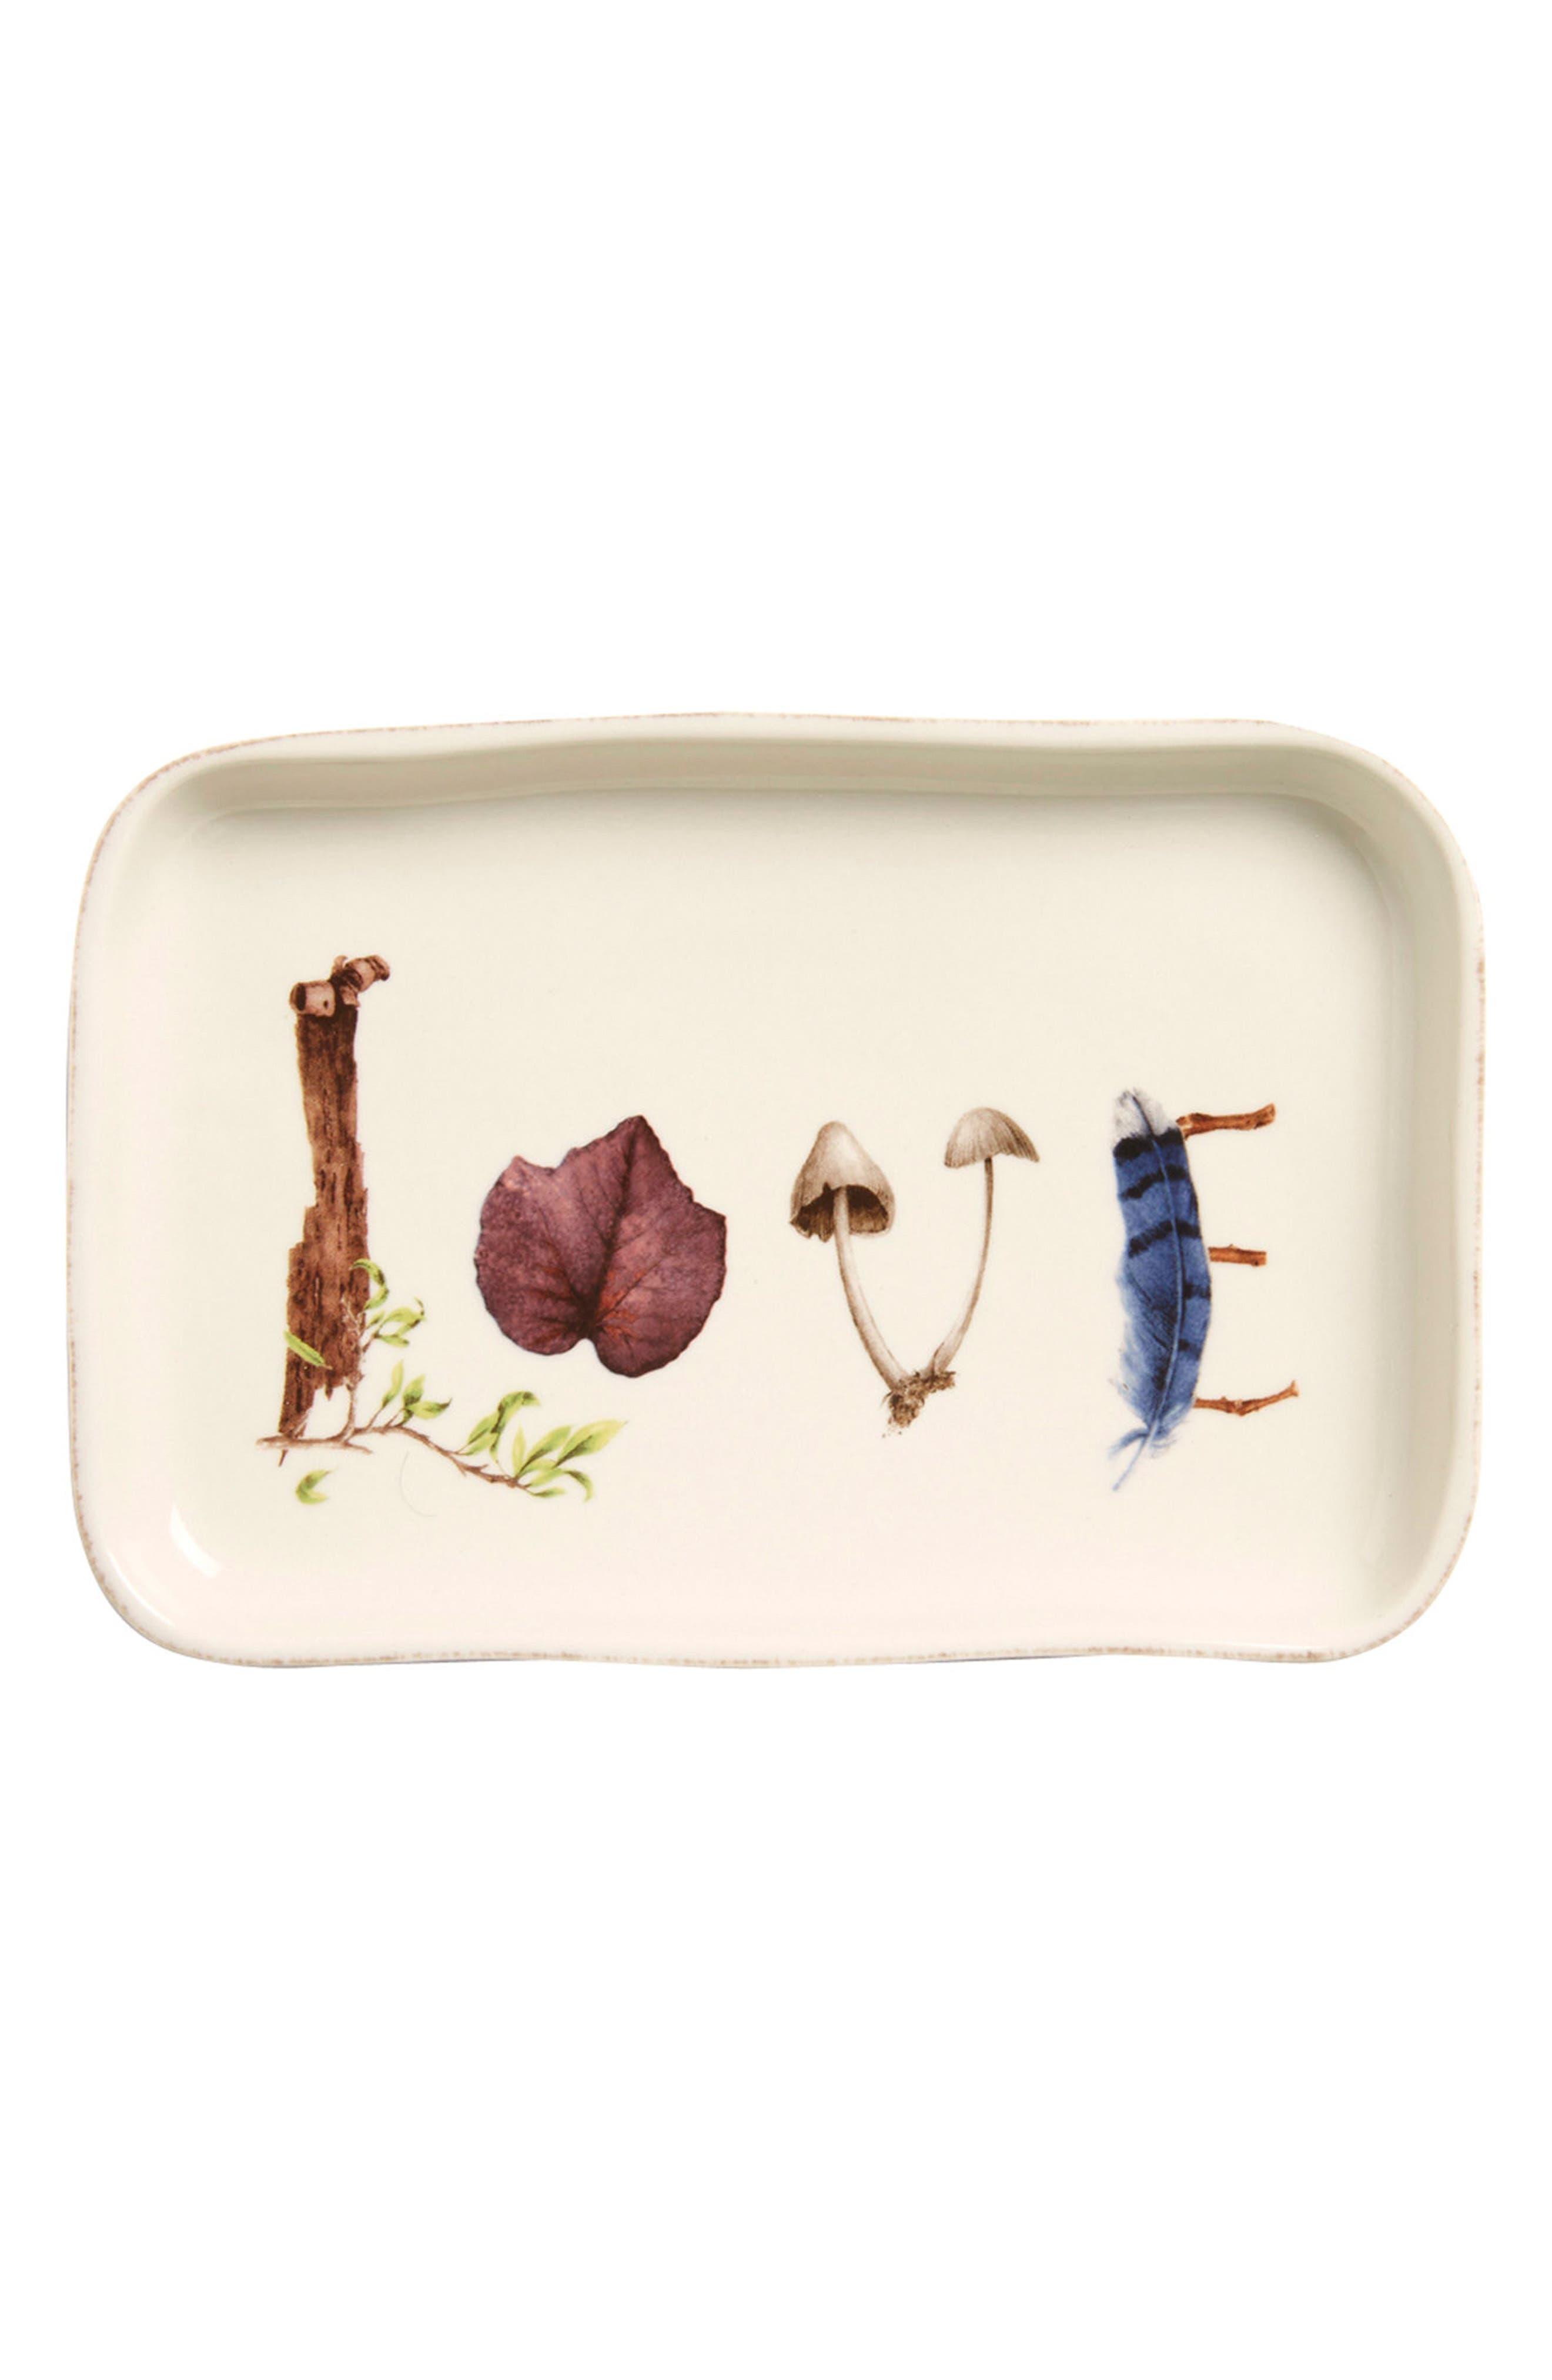 Forest Walk Love Ceramic Tray,                         Main,                         color, CAF AU LAIT